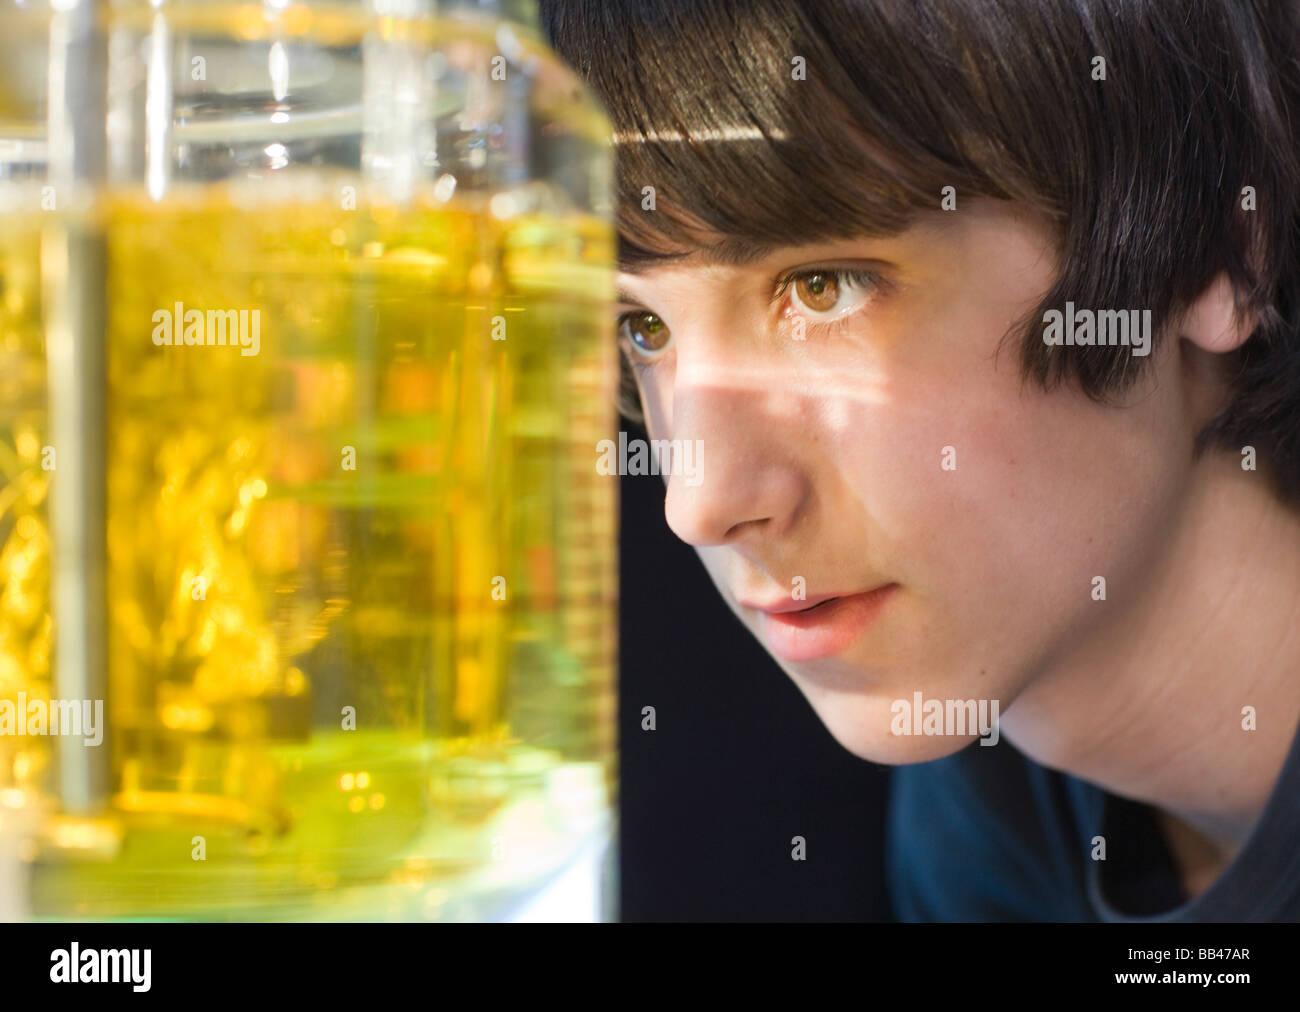 Schüler im Chemieunterricht Stockbild